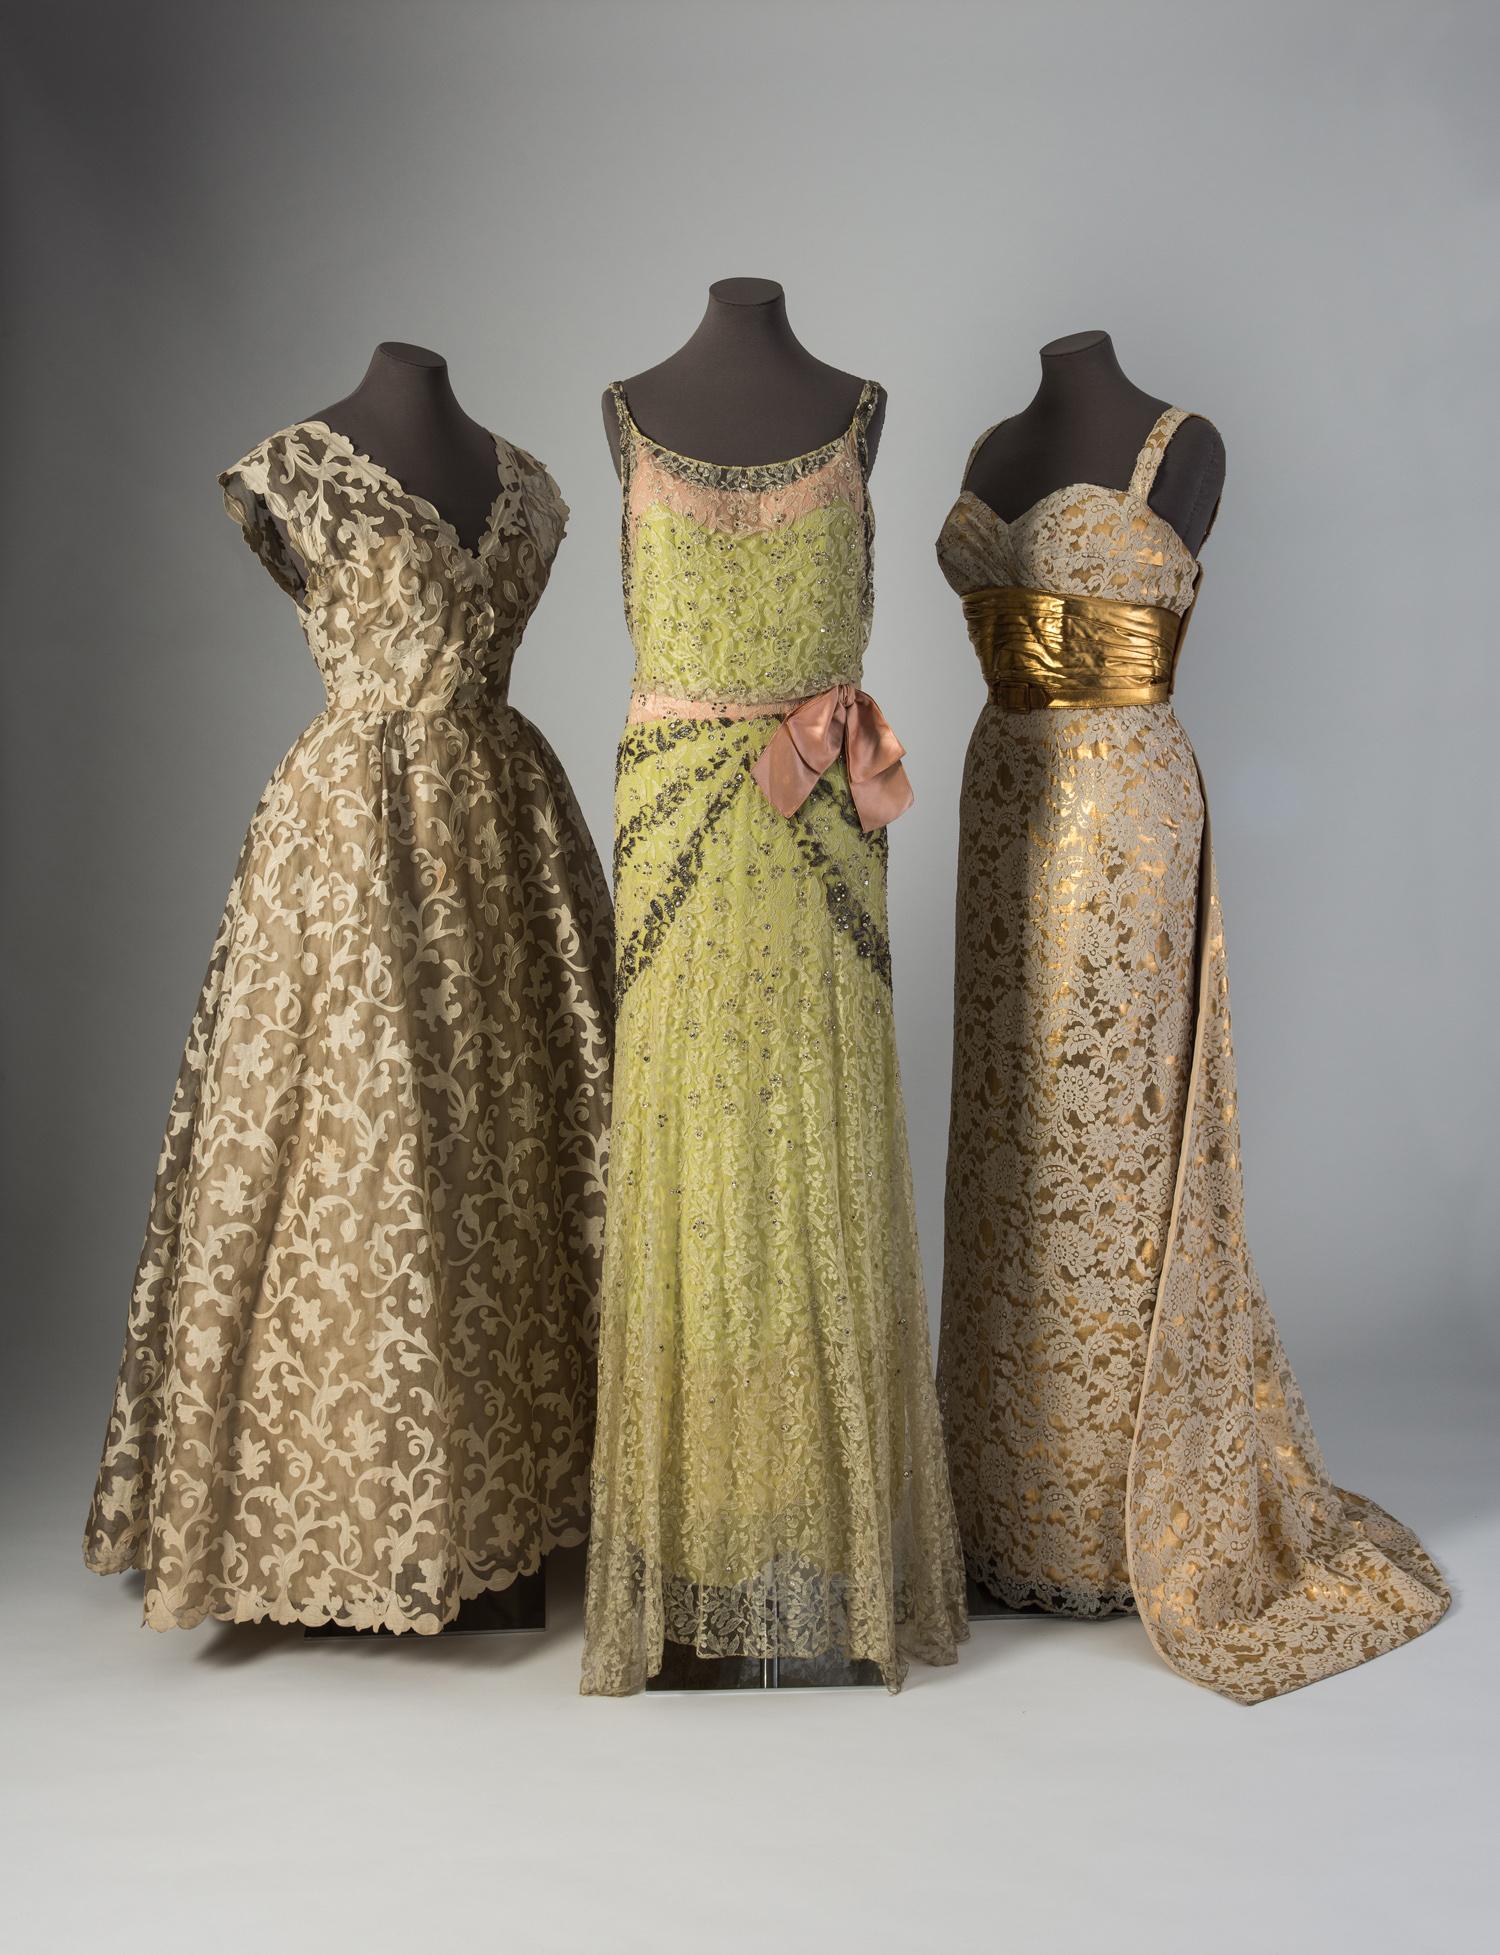 Photo courtesy Fashion Museum Bath.